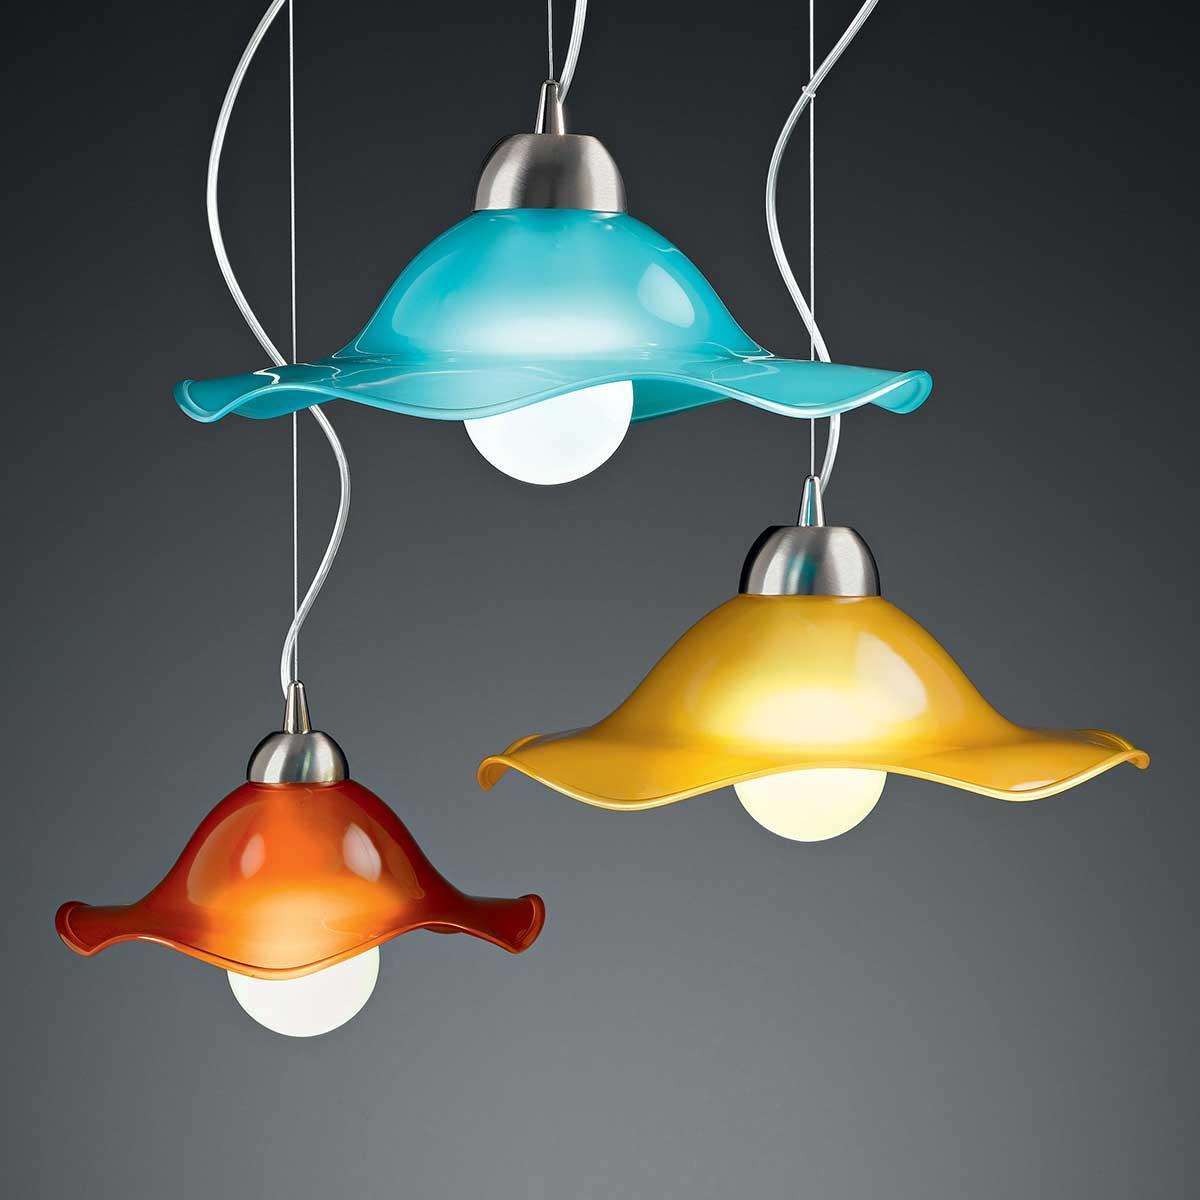 Mariluna Murano Glass Pendant Light